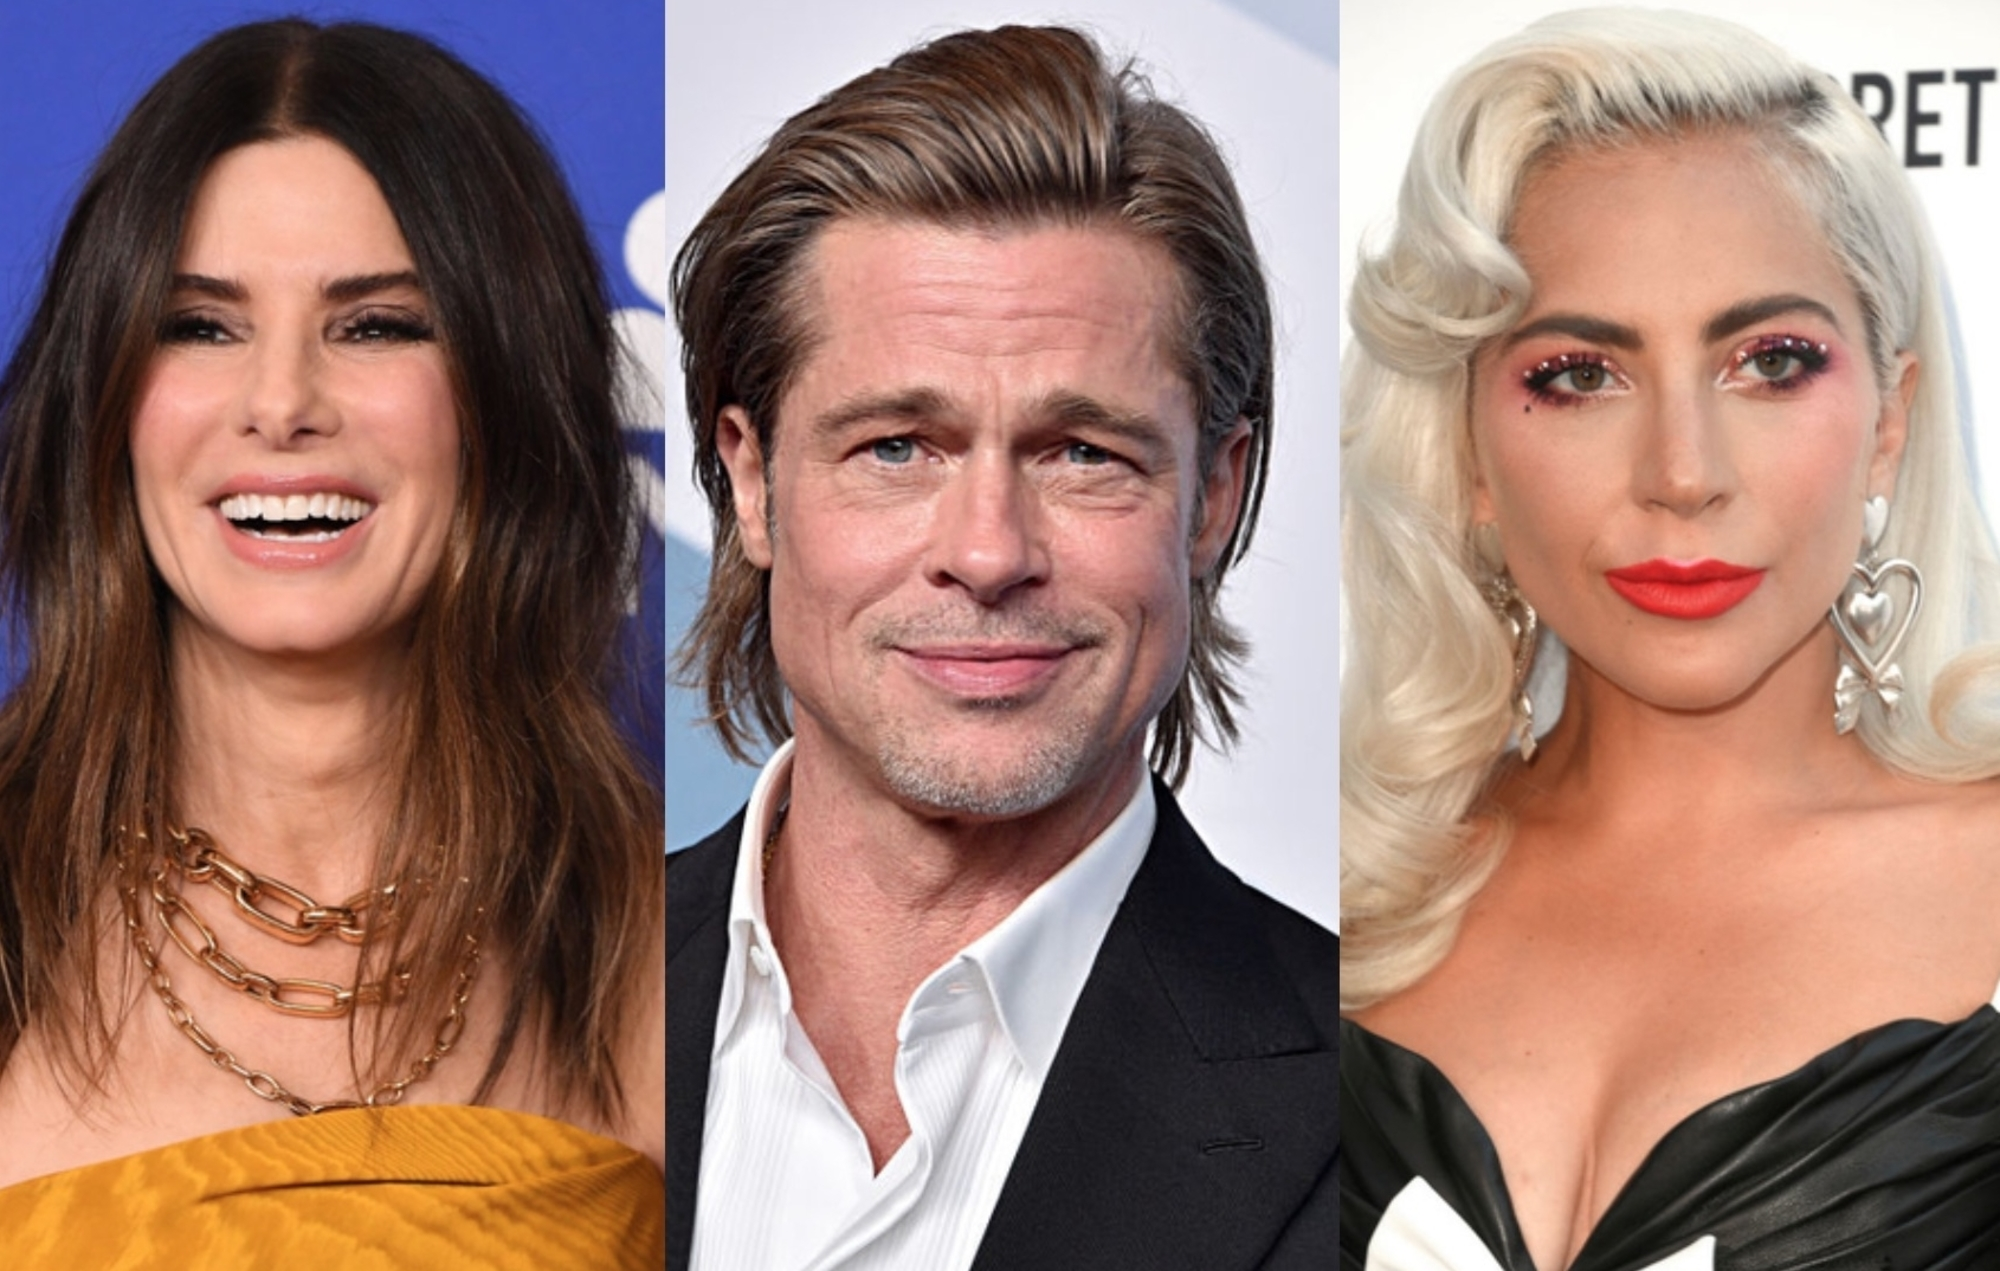 Sandra Bullock, Brad Pitt and Lady Gaga